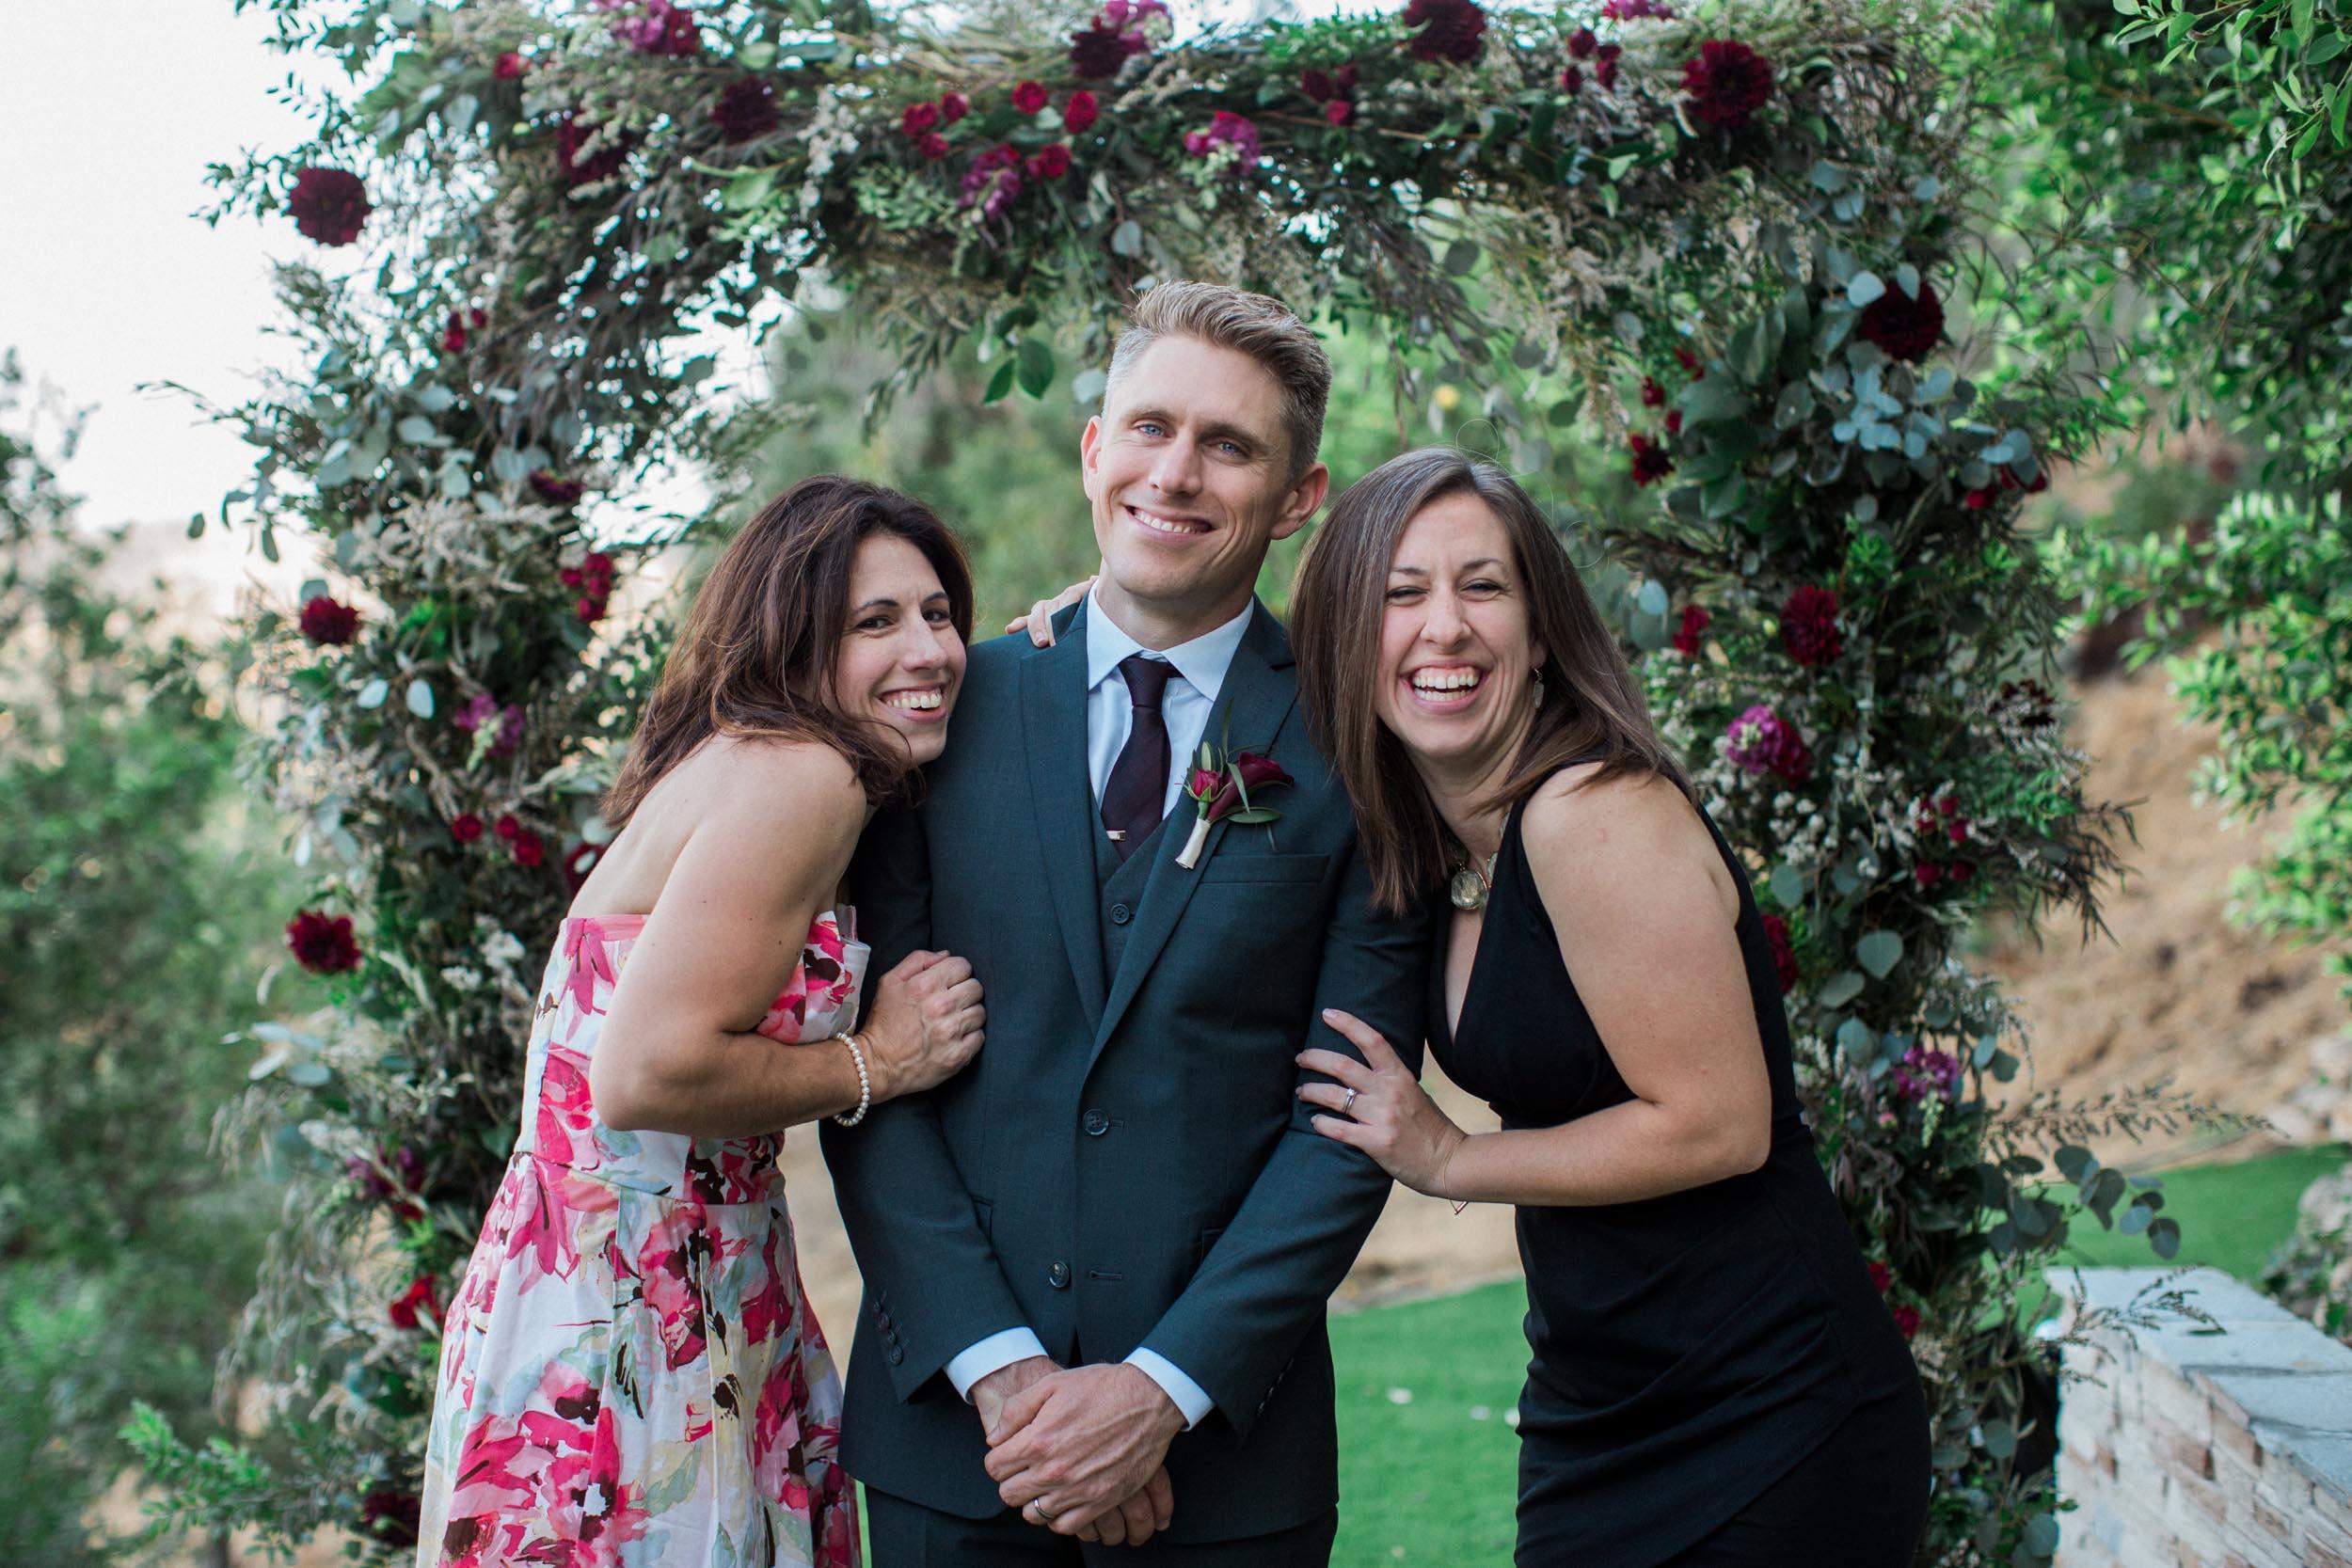 BKM-Photography-Highland-Park-Los-Angeles-Backyard-Wedding-0036.jpg